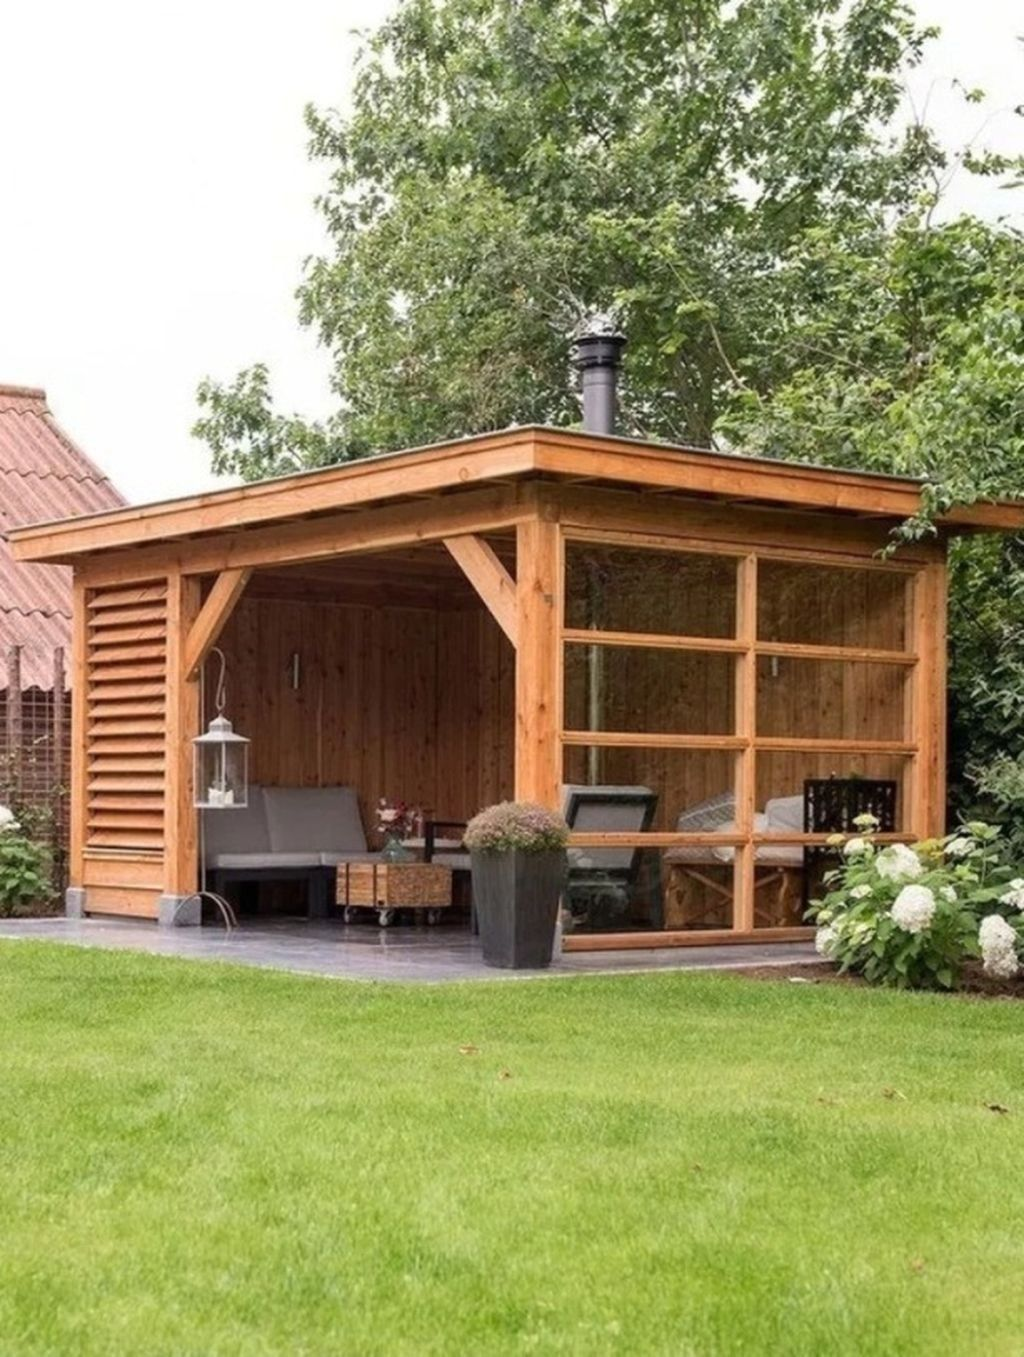 78 Luxury Backyard Storage Shed Design Ideas Backyardstorage Backyard Backyardstorage Design Ideas Lux In 2020 Holzhutte Garten Uberdachung Garten Garten Pavillon